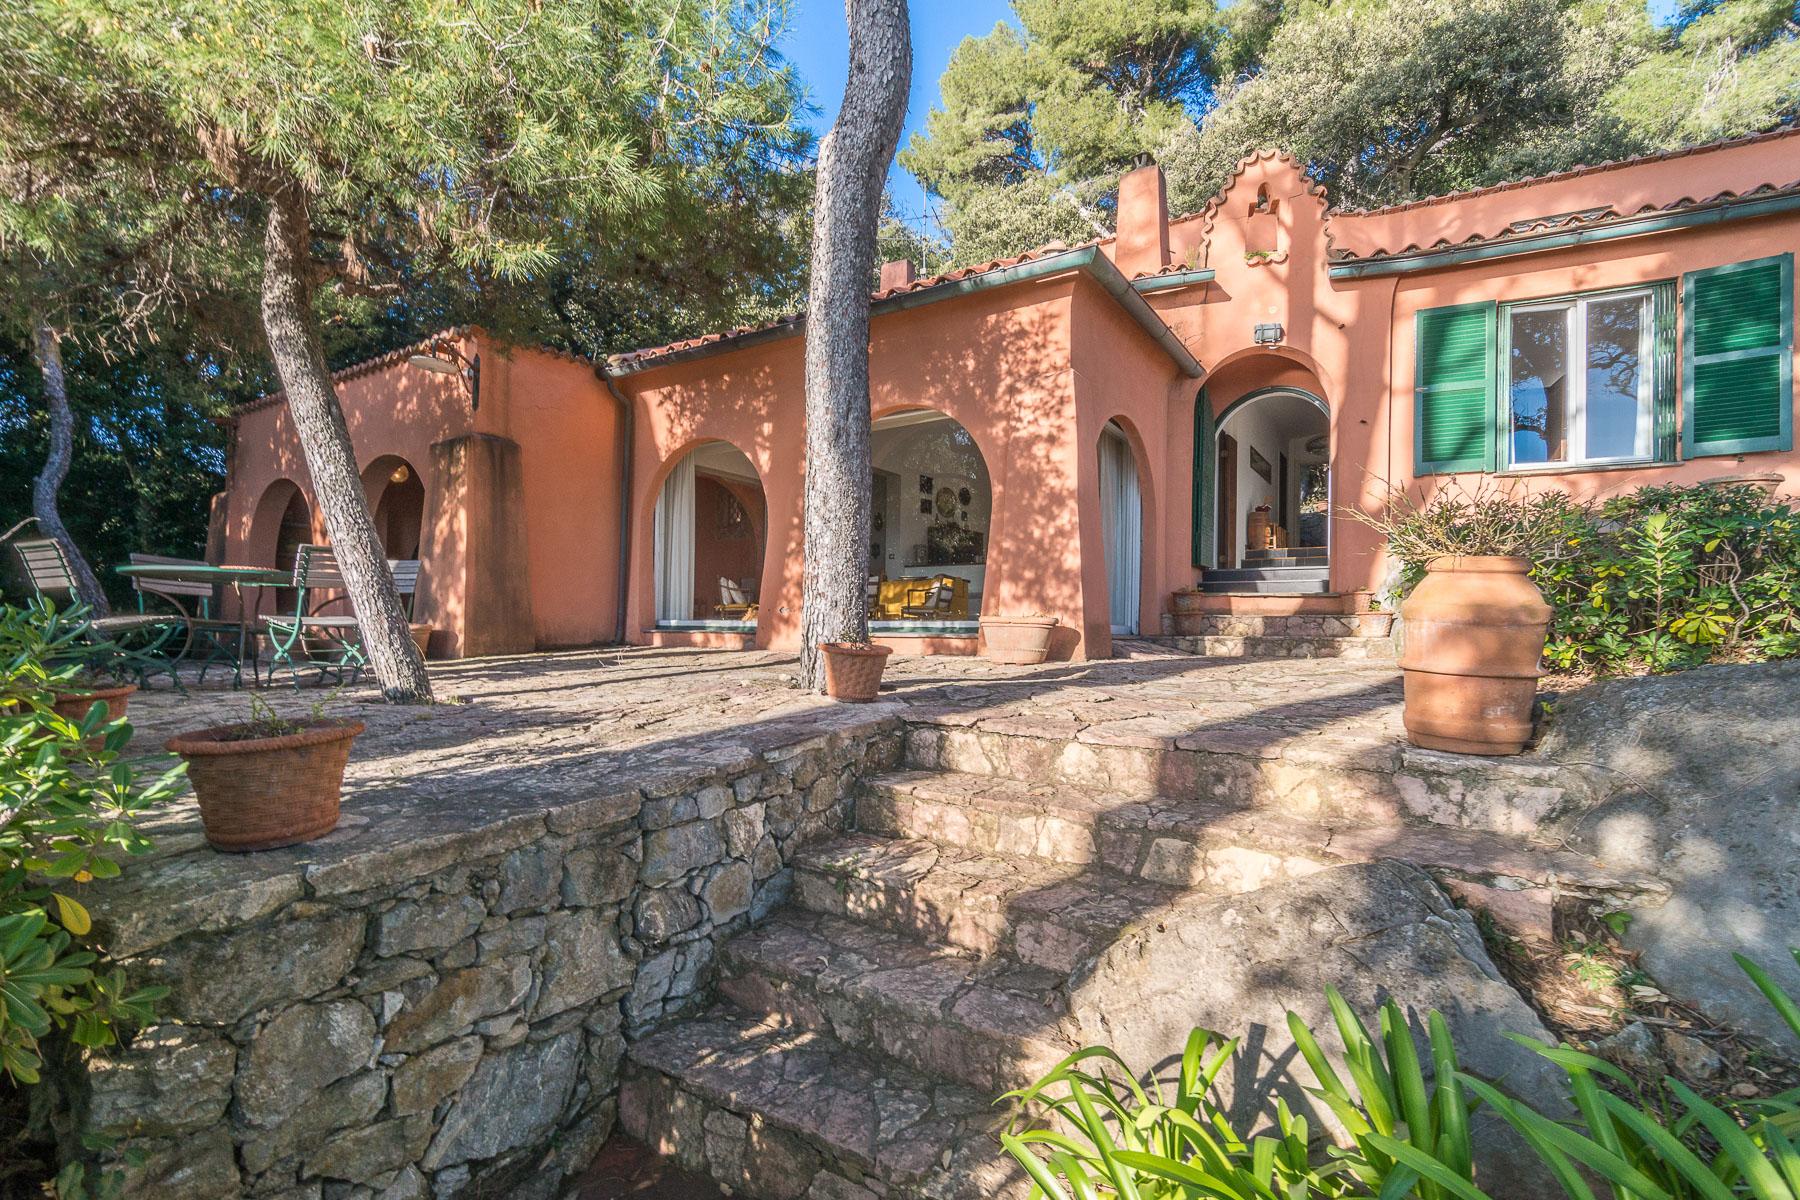 Villa in Vendita a Lerici: 5 locali, 330 mq - Foto 5